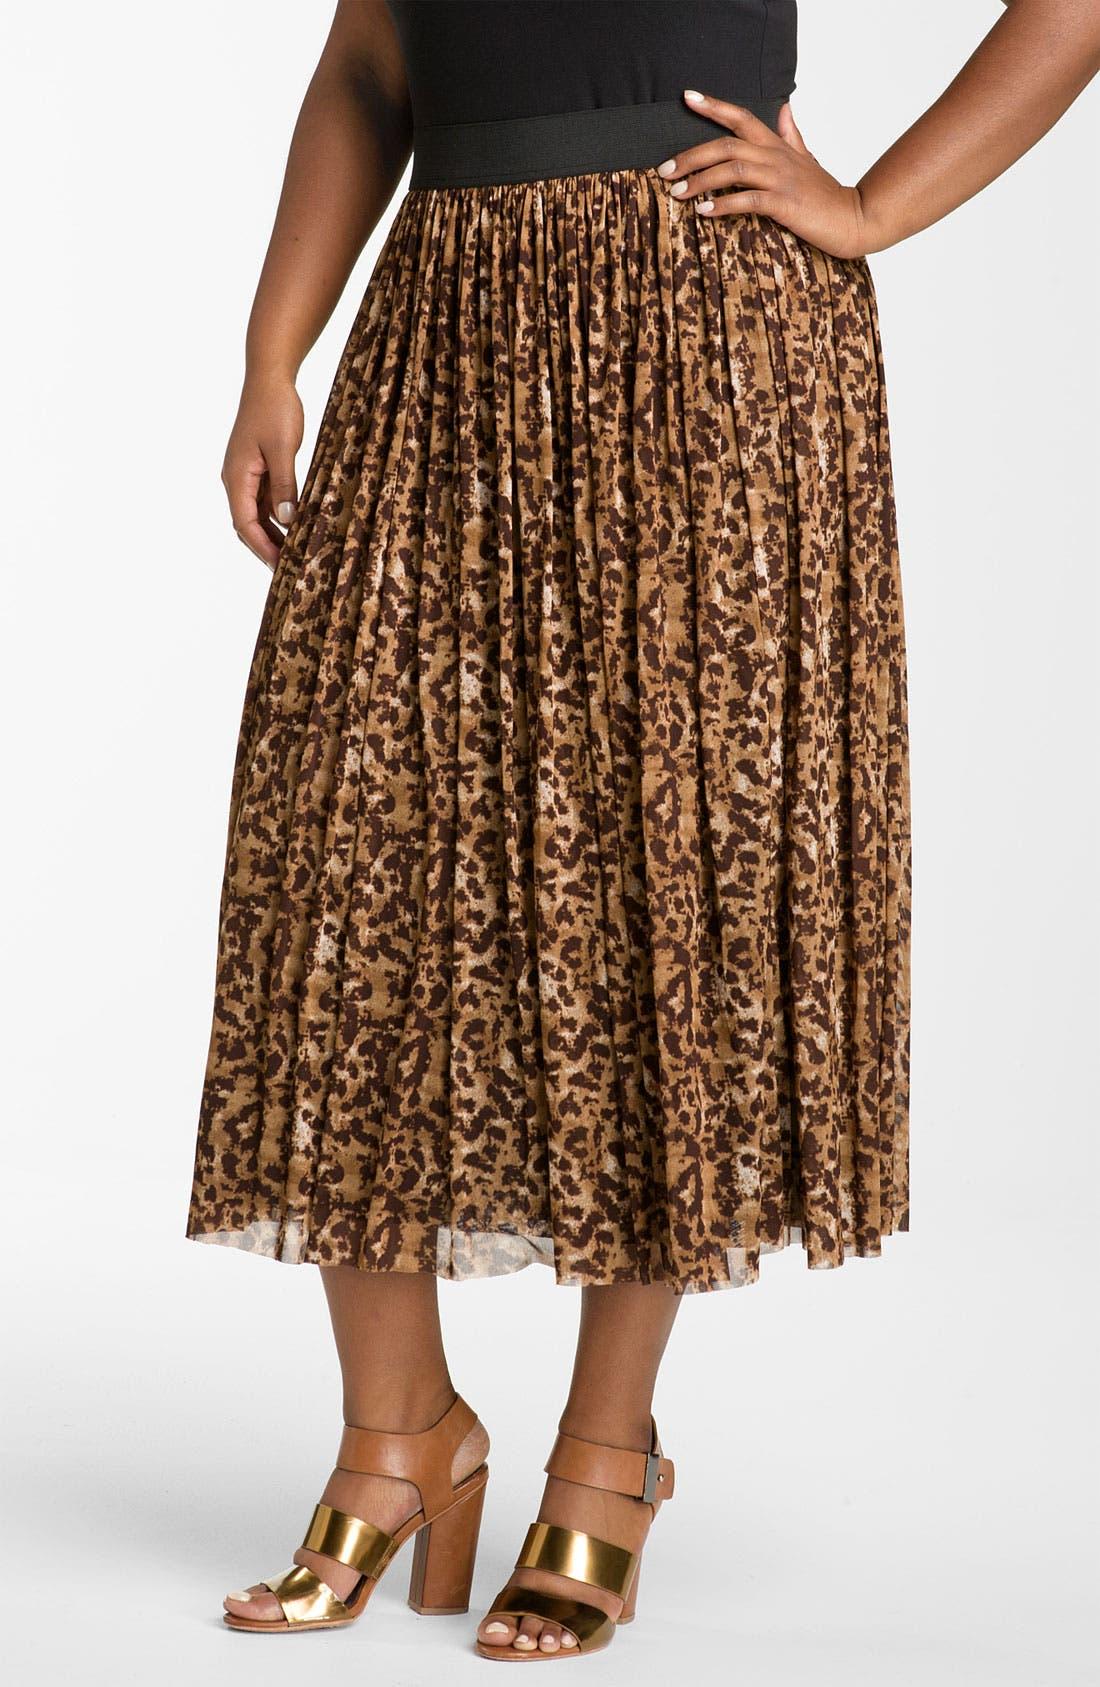 Main Image - Vince Camuto 'Textured Spots' Animal Print Skirt (Plus)